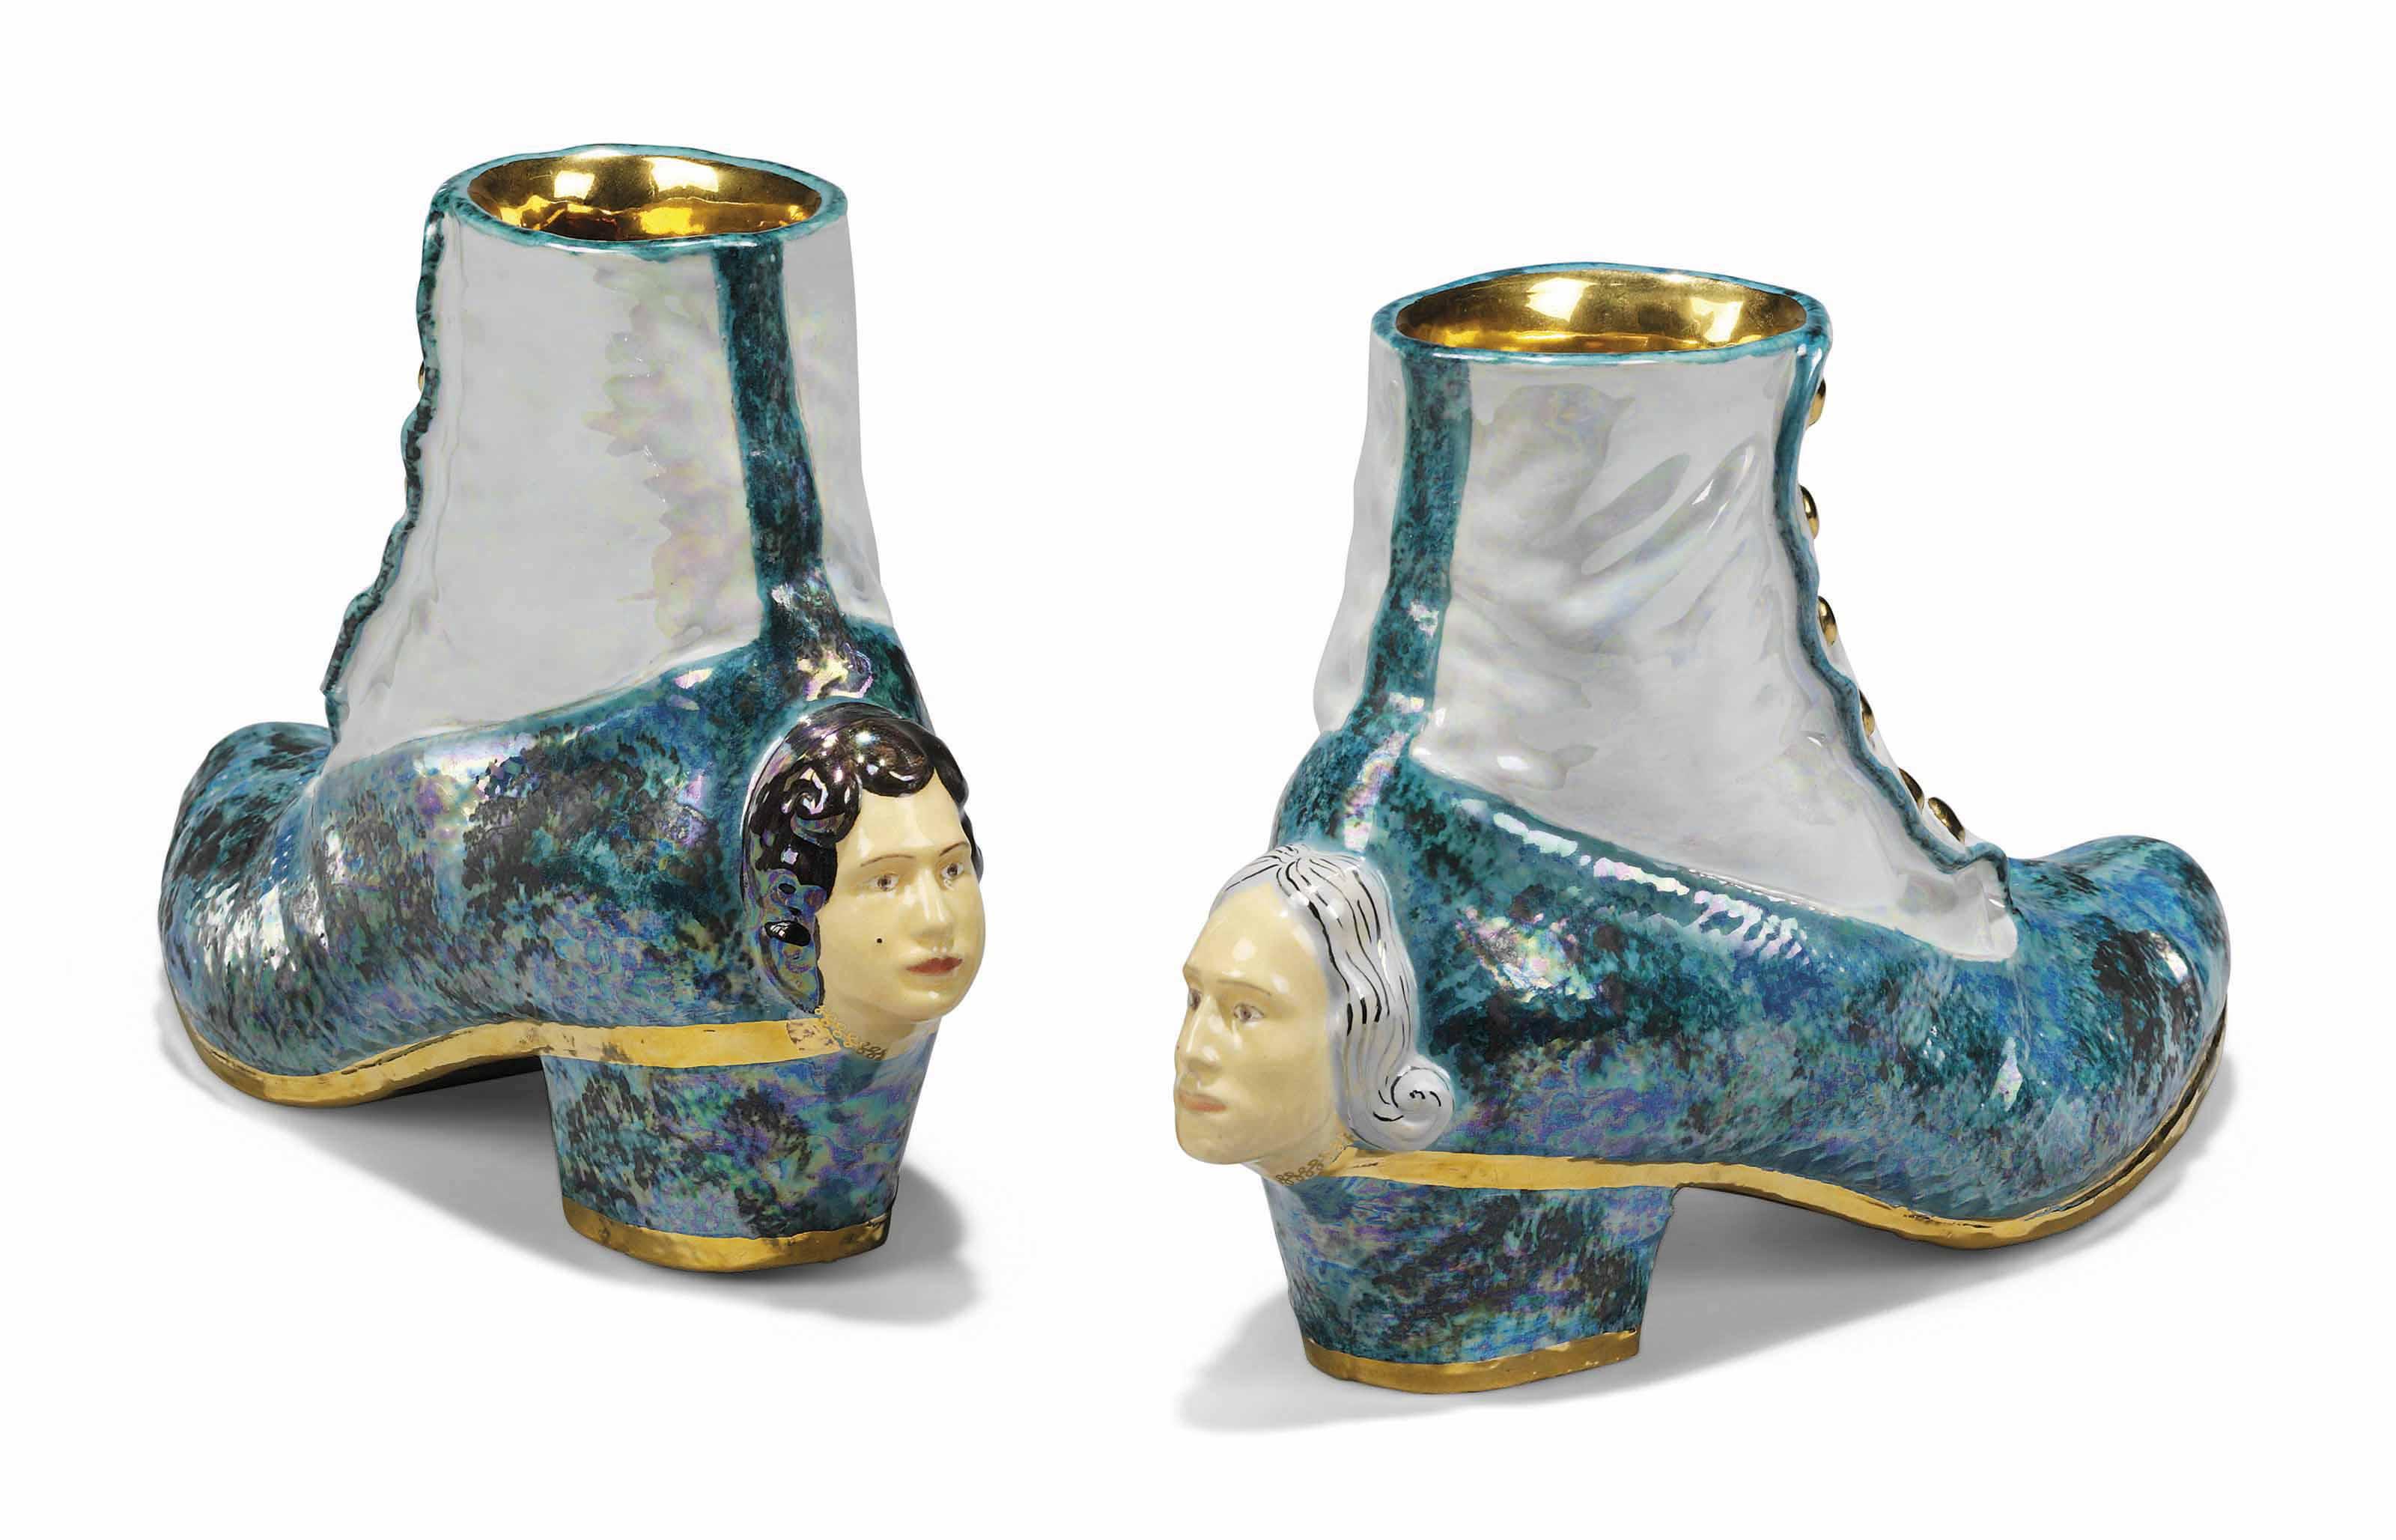 ScarpaGhetta (Shoe Spatter Guards)